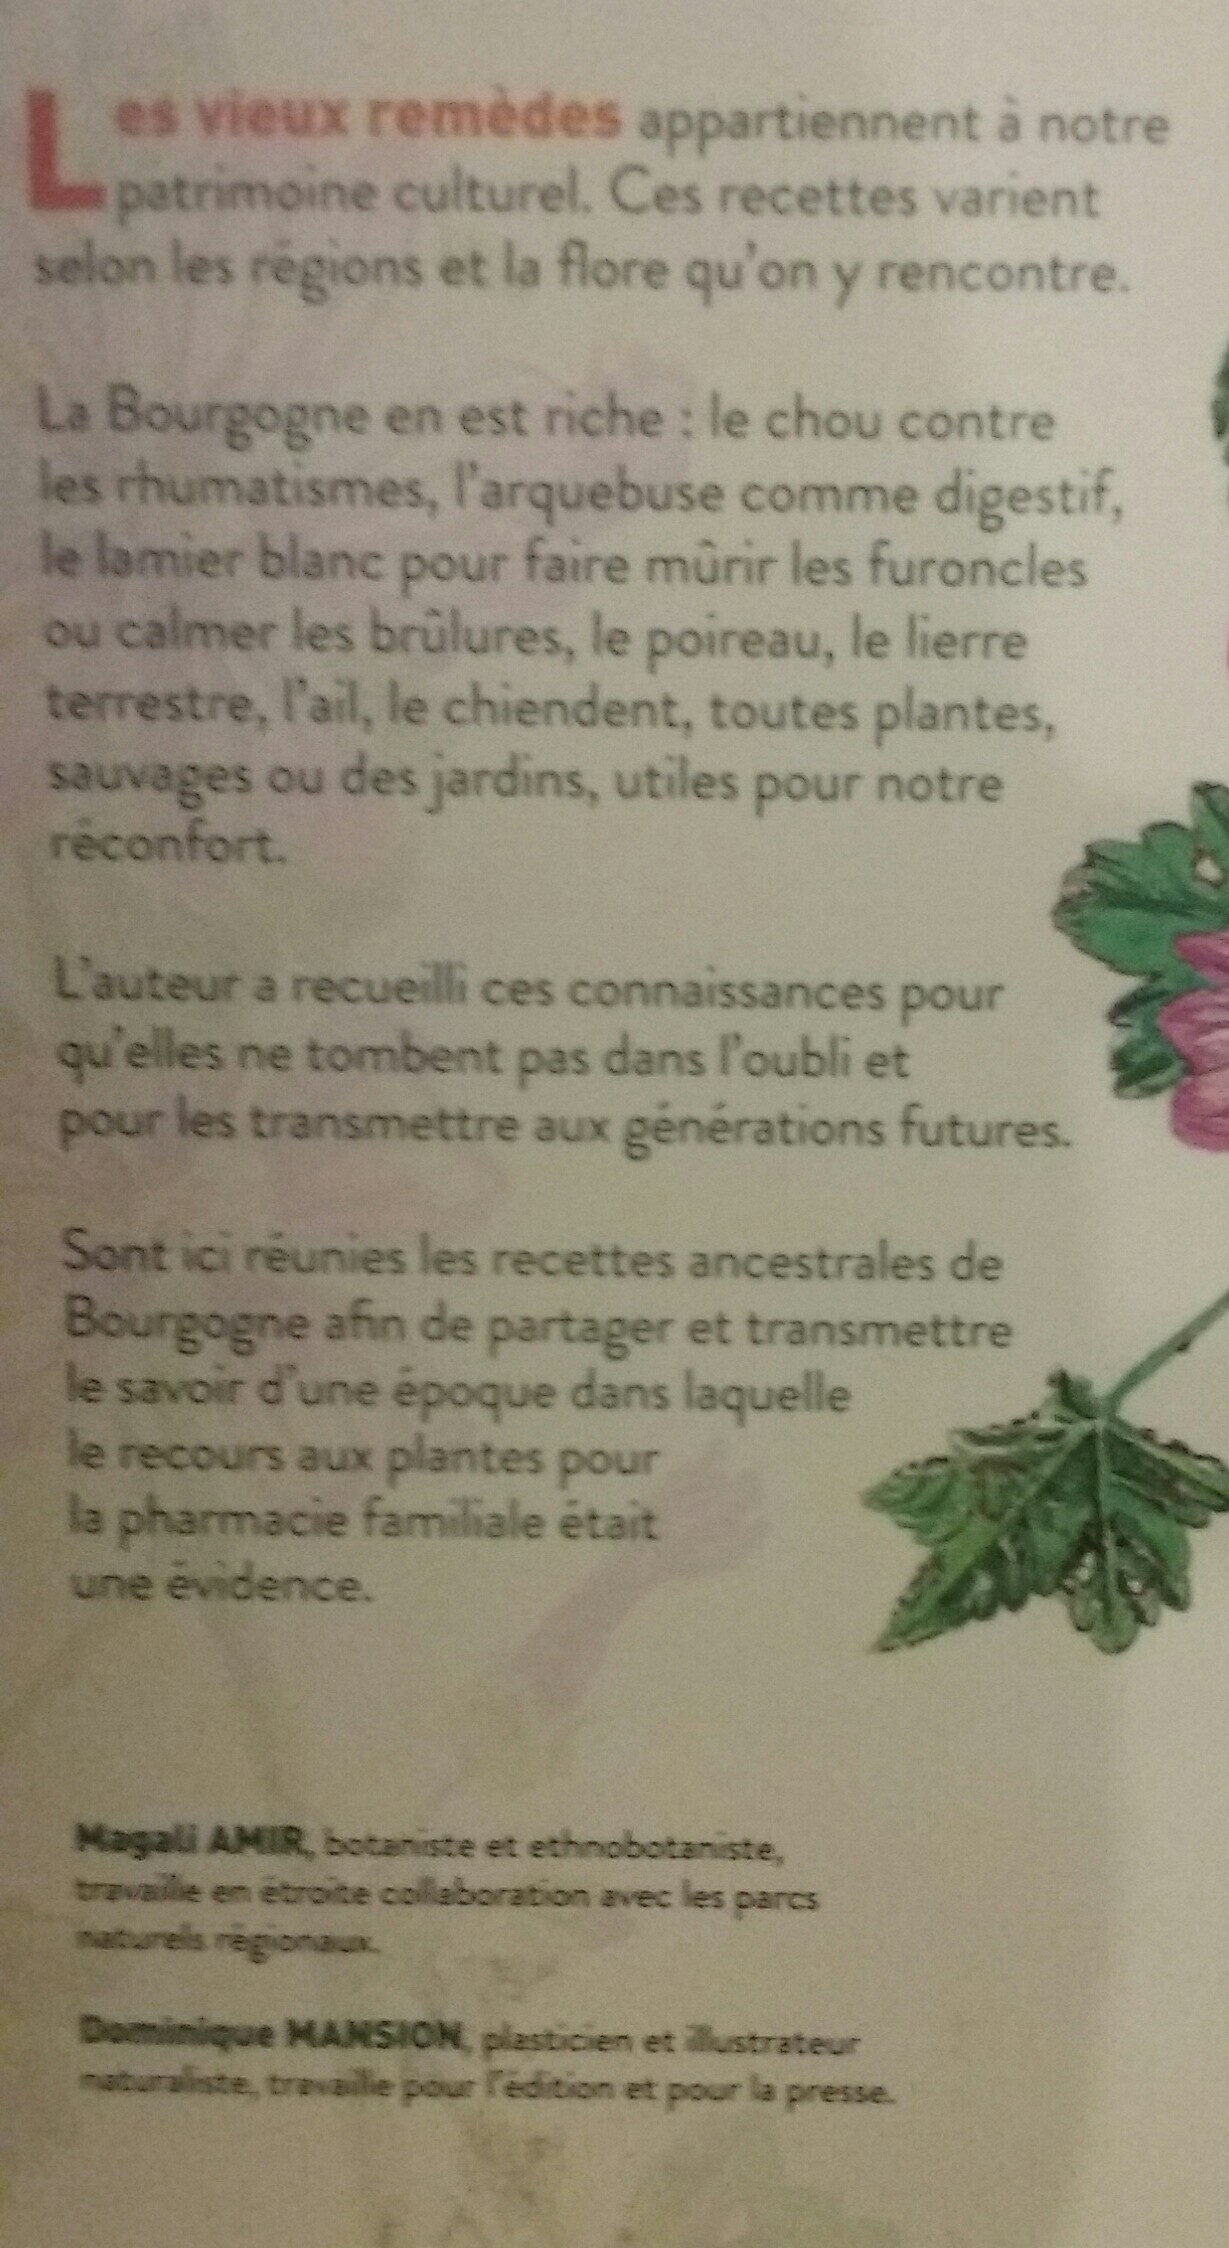 vieux remedes de Bourgogne - Ingredients - fr